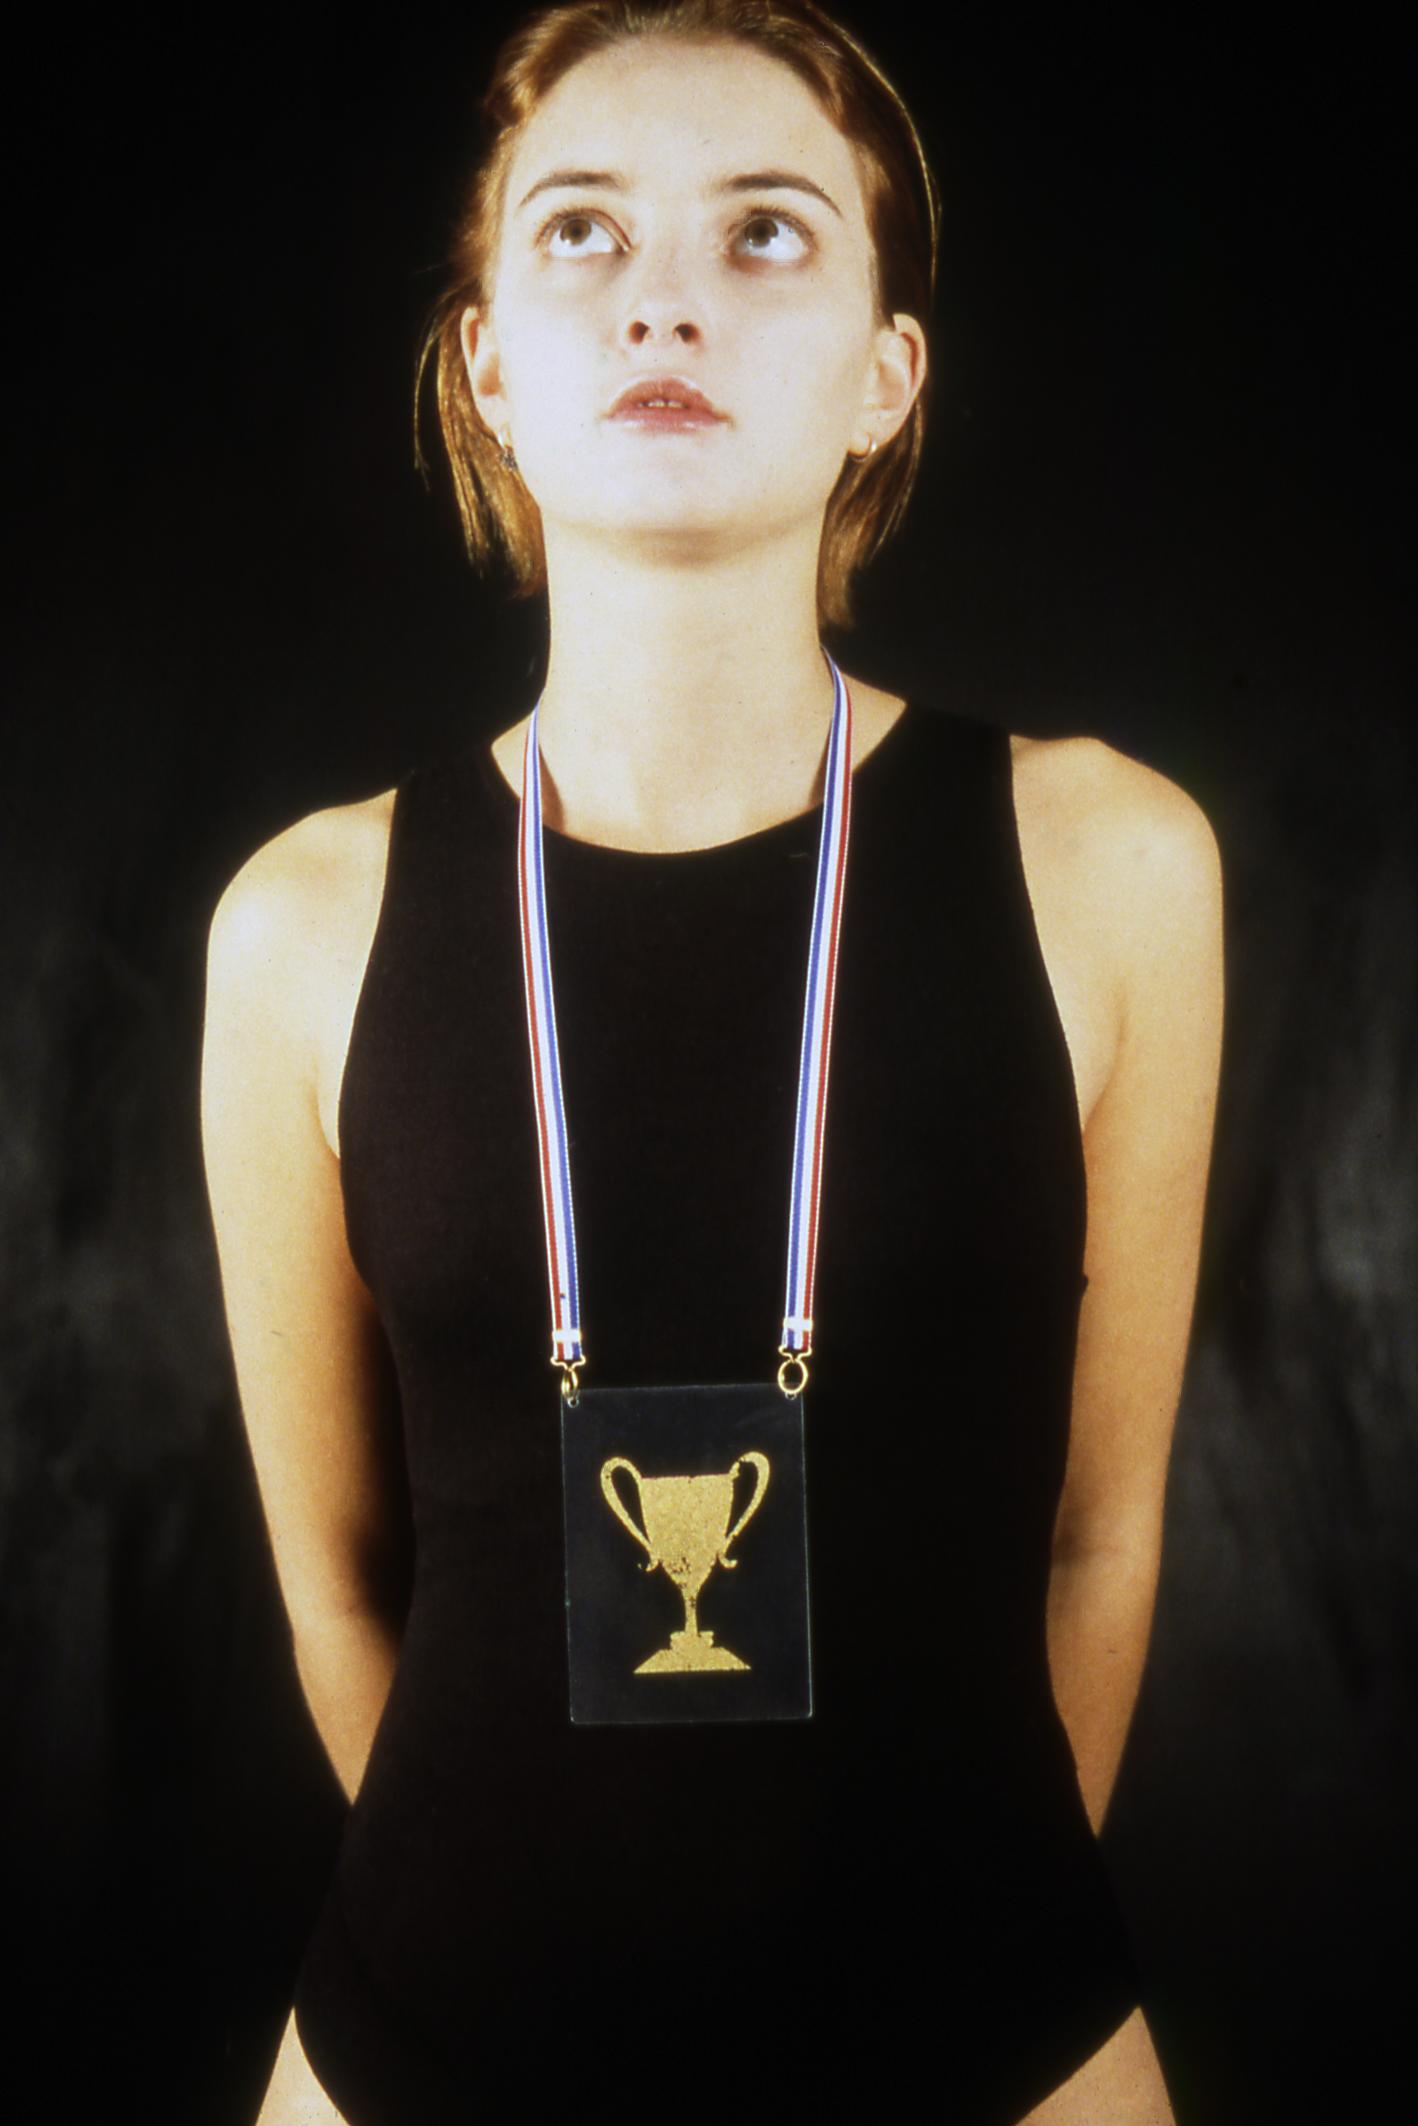 Susanne Klemm, And he winner is... halssieraad, 1997. Foto met dank aan Susanne Klemm©